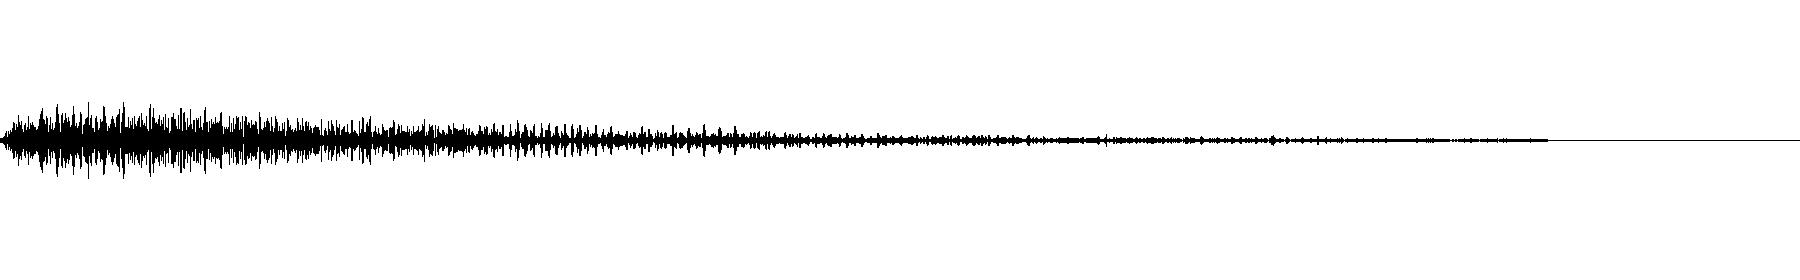 pianojazz